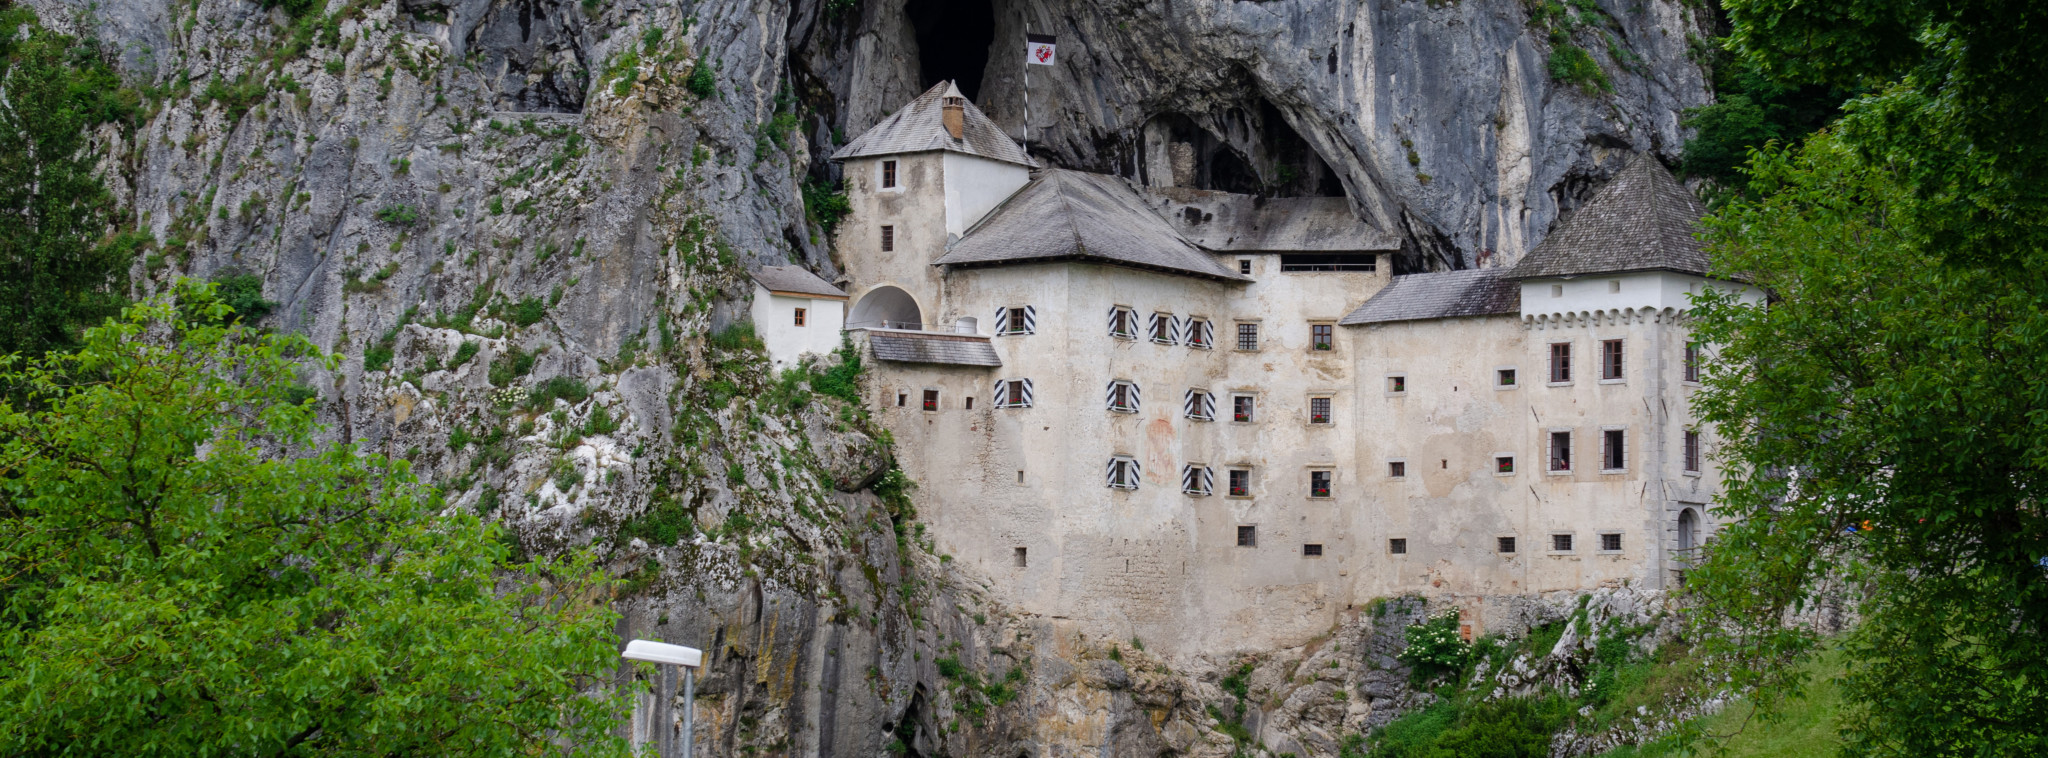 Die Höhlenburg Predjama in Slowenien